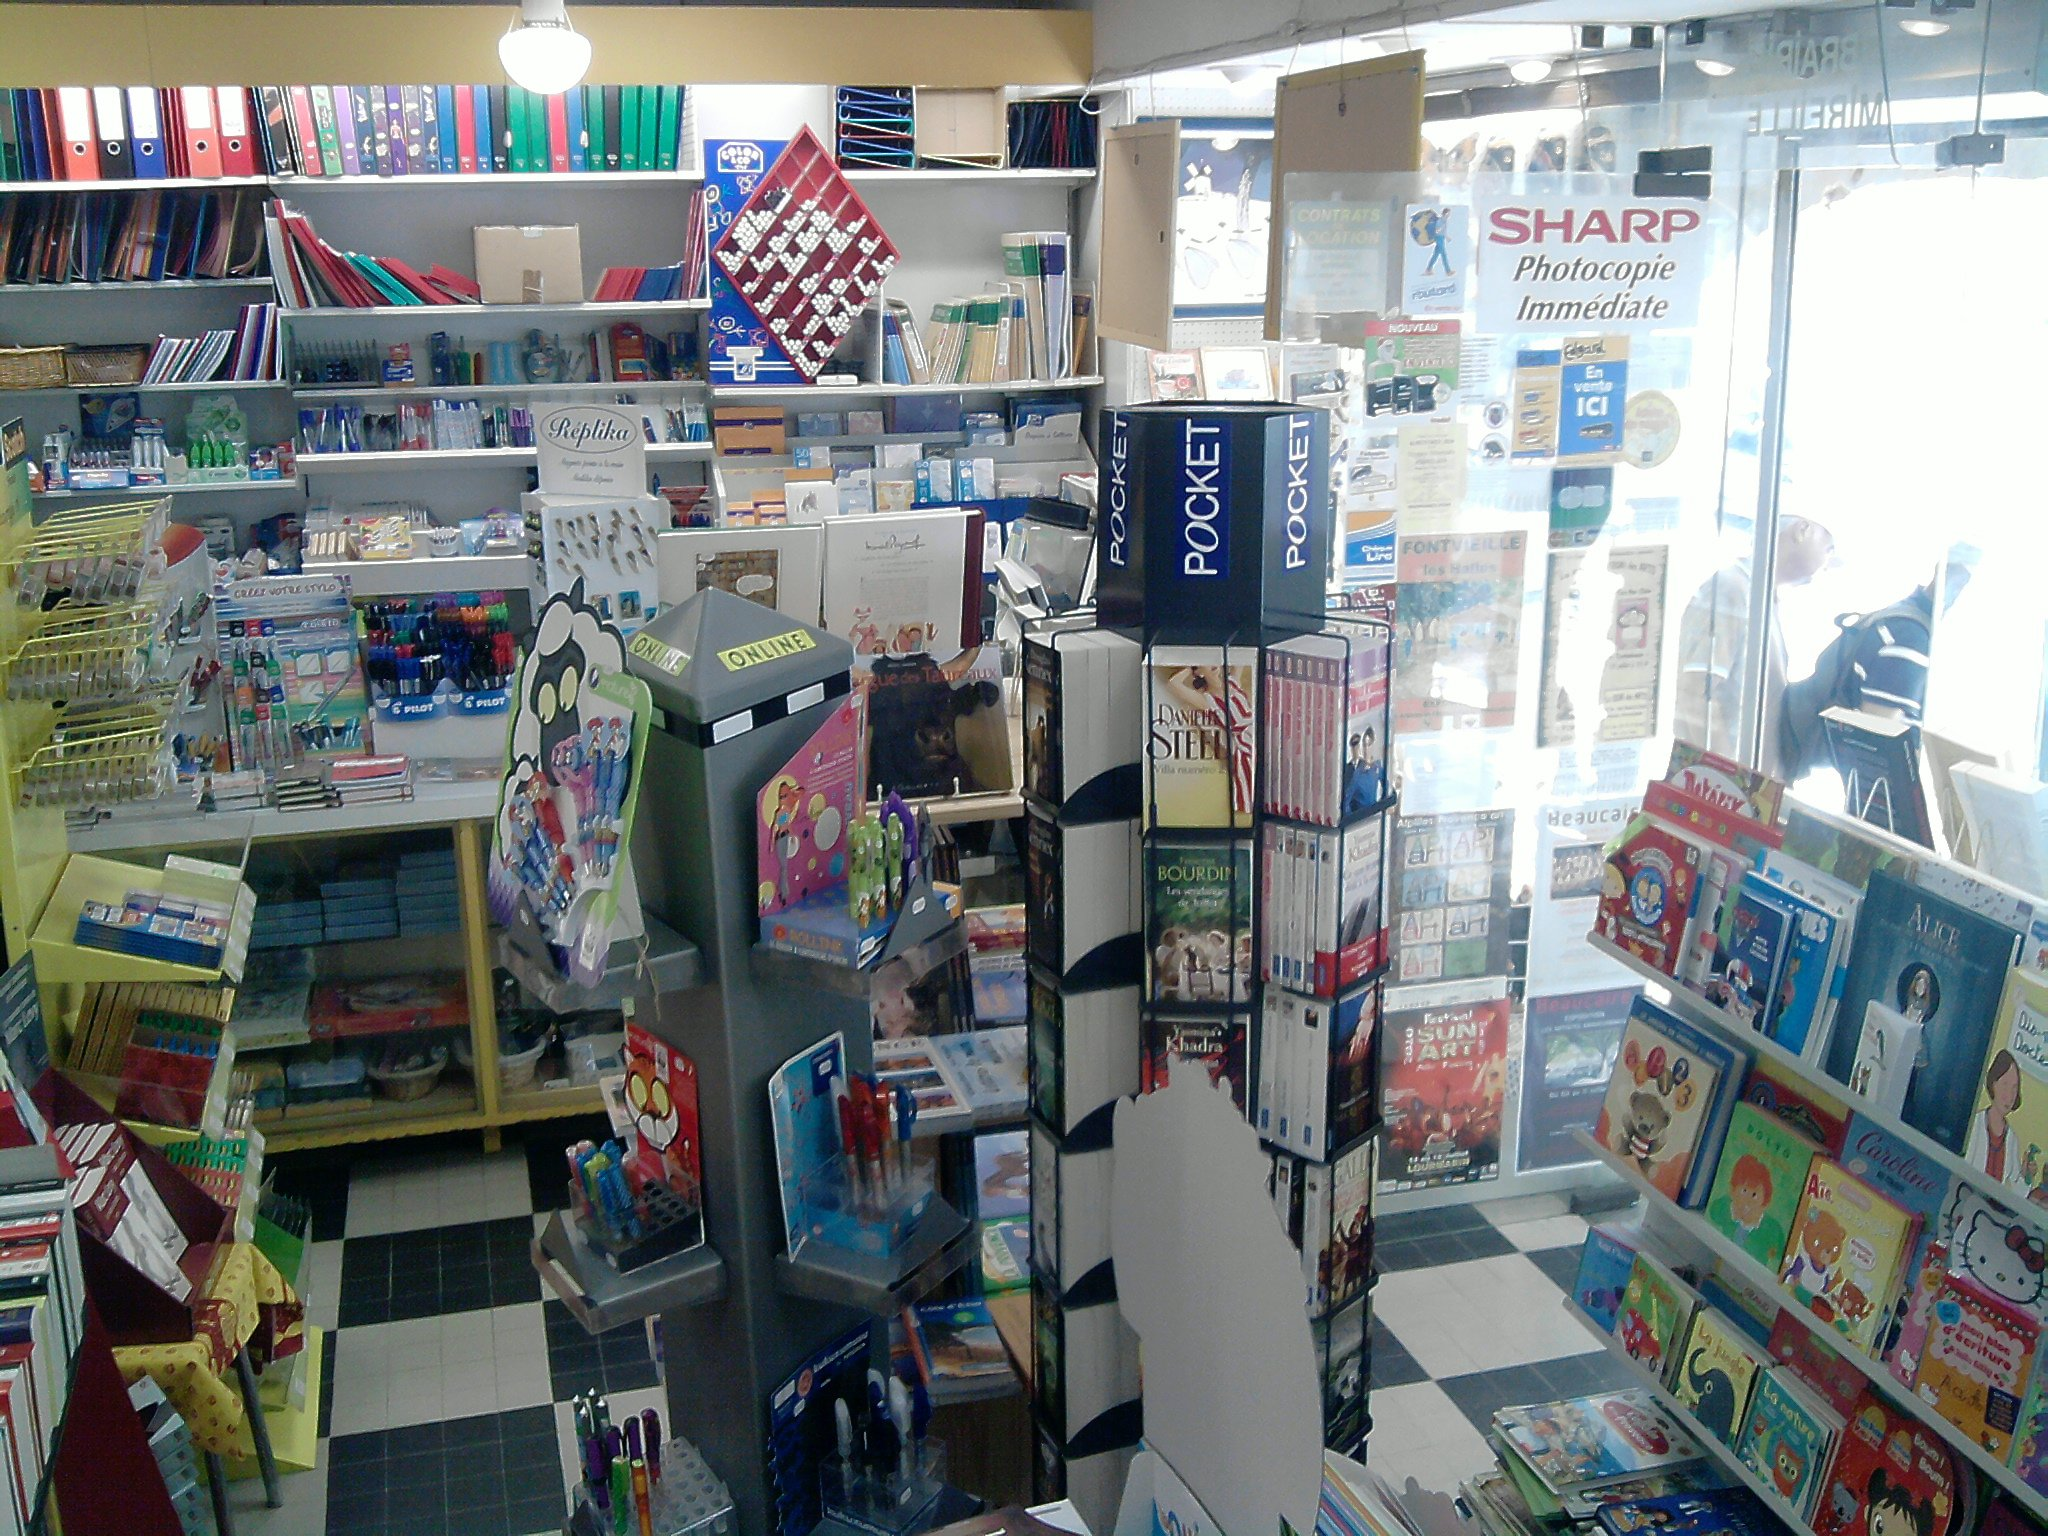 Librairie intérieure